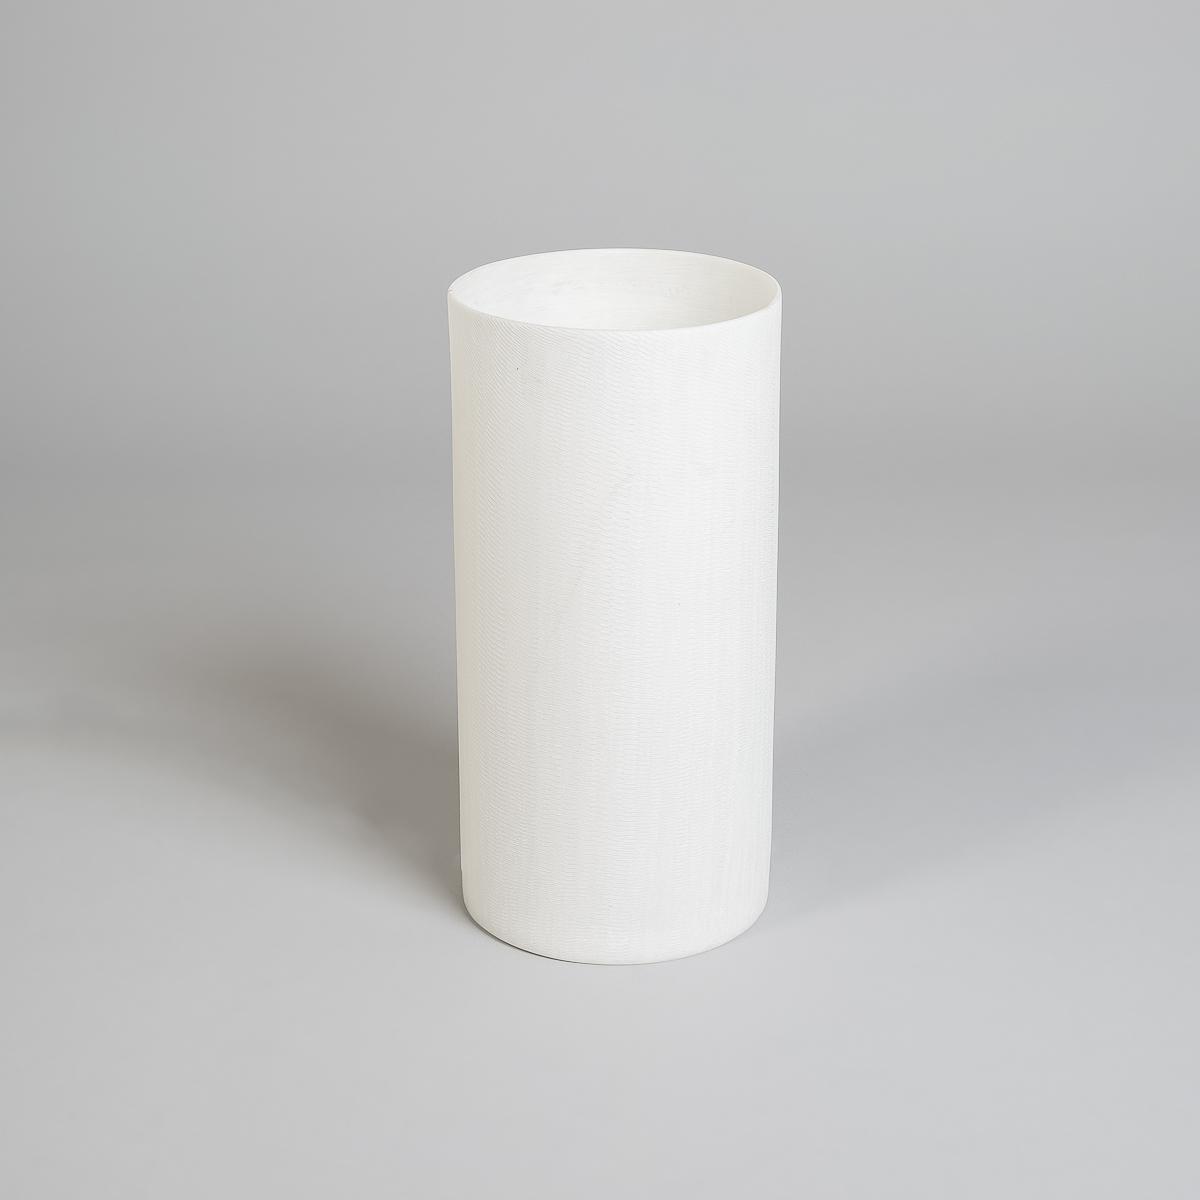 Norah lampe i Sandstein - 50 cm-0